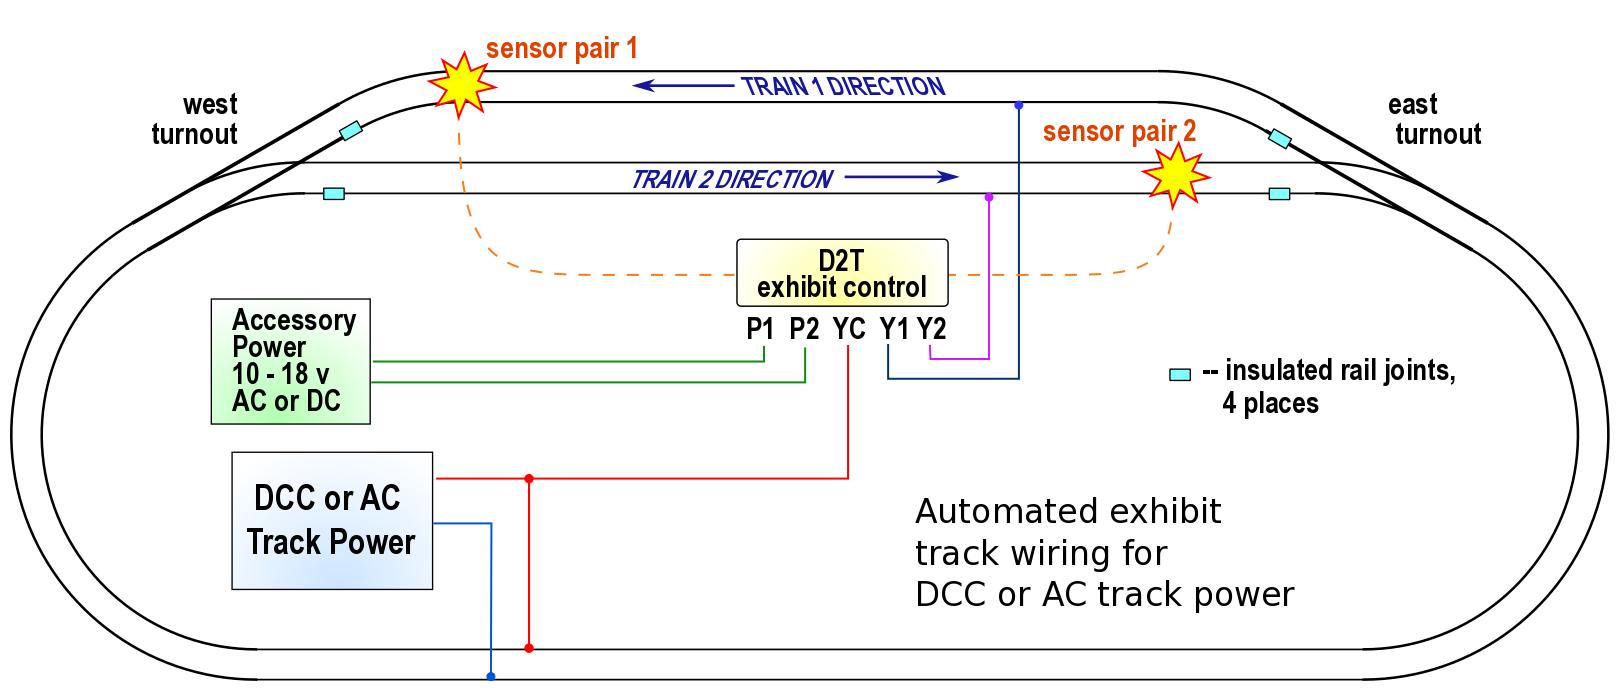 Loop Wiring Diagram For Ac Or Dcc